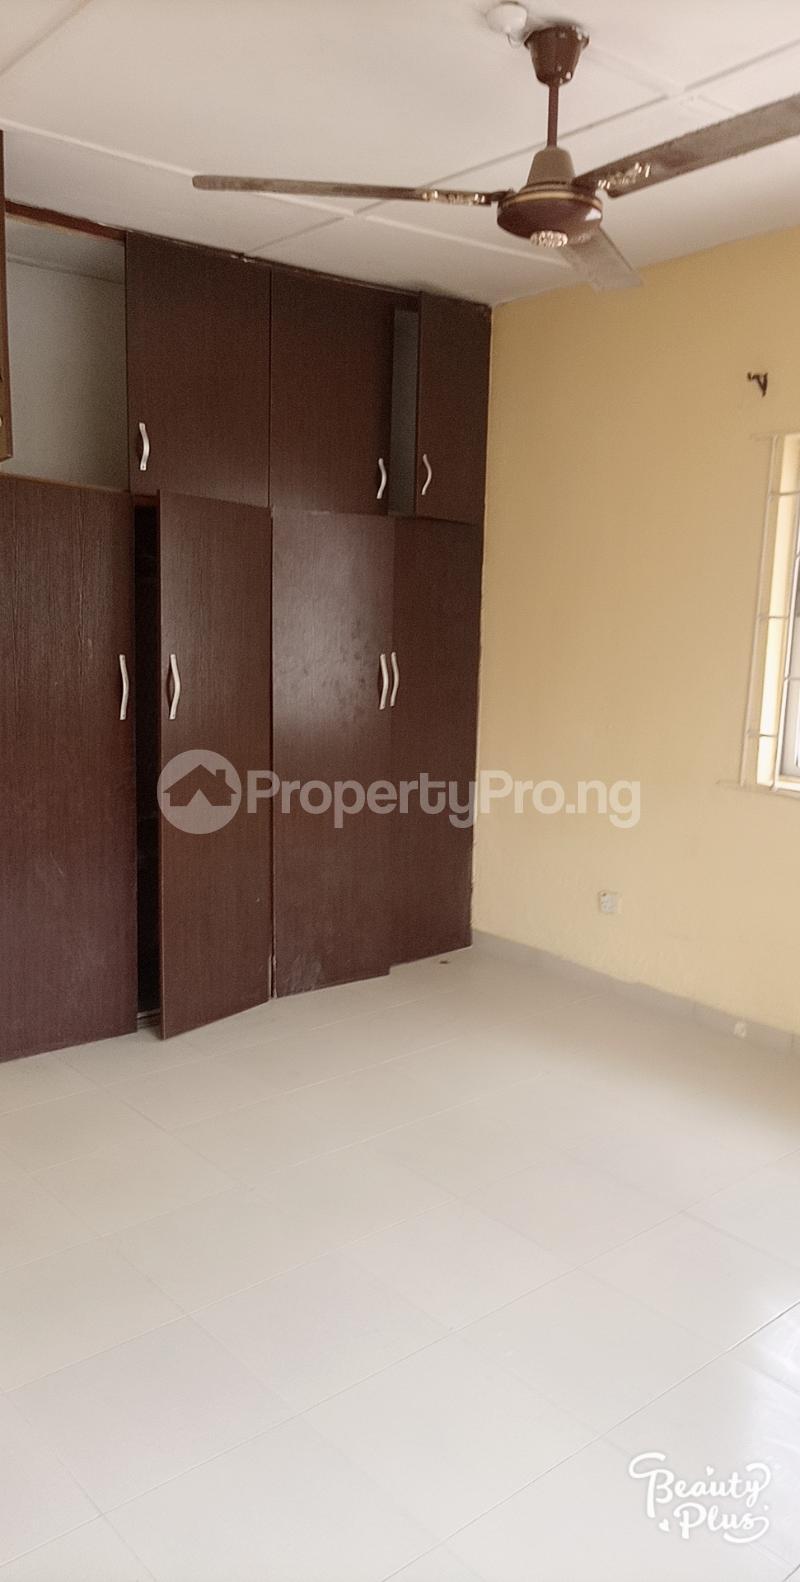 5 bedroom Semi Detached Duplex House for sale Ajao estate Isolo. Lagos Ajao Estate Isolo Lagos - 4